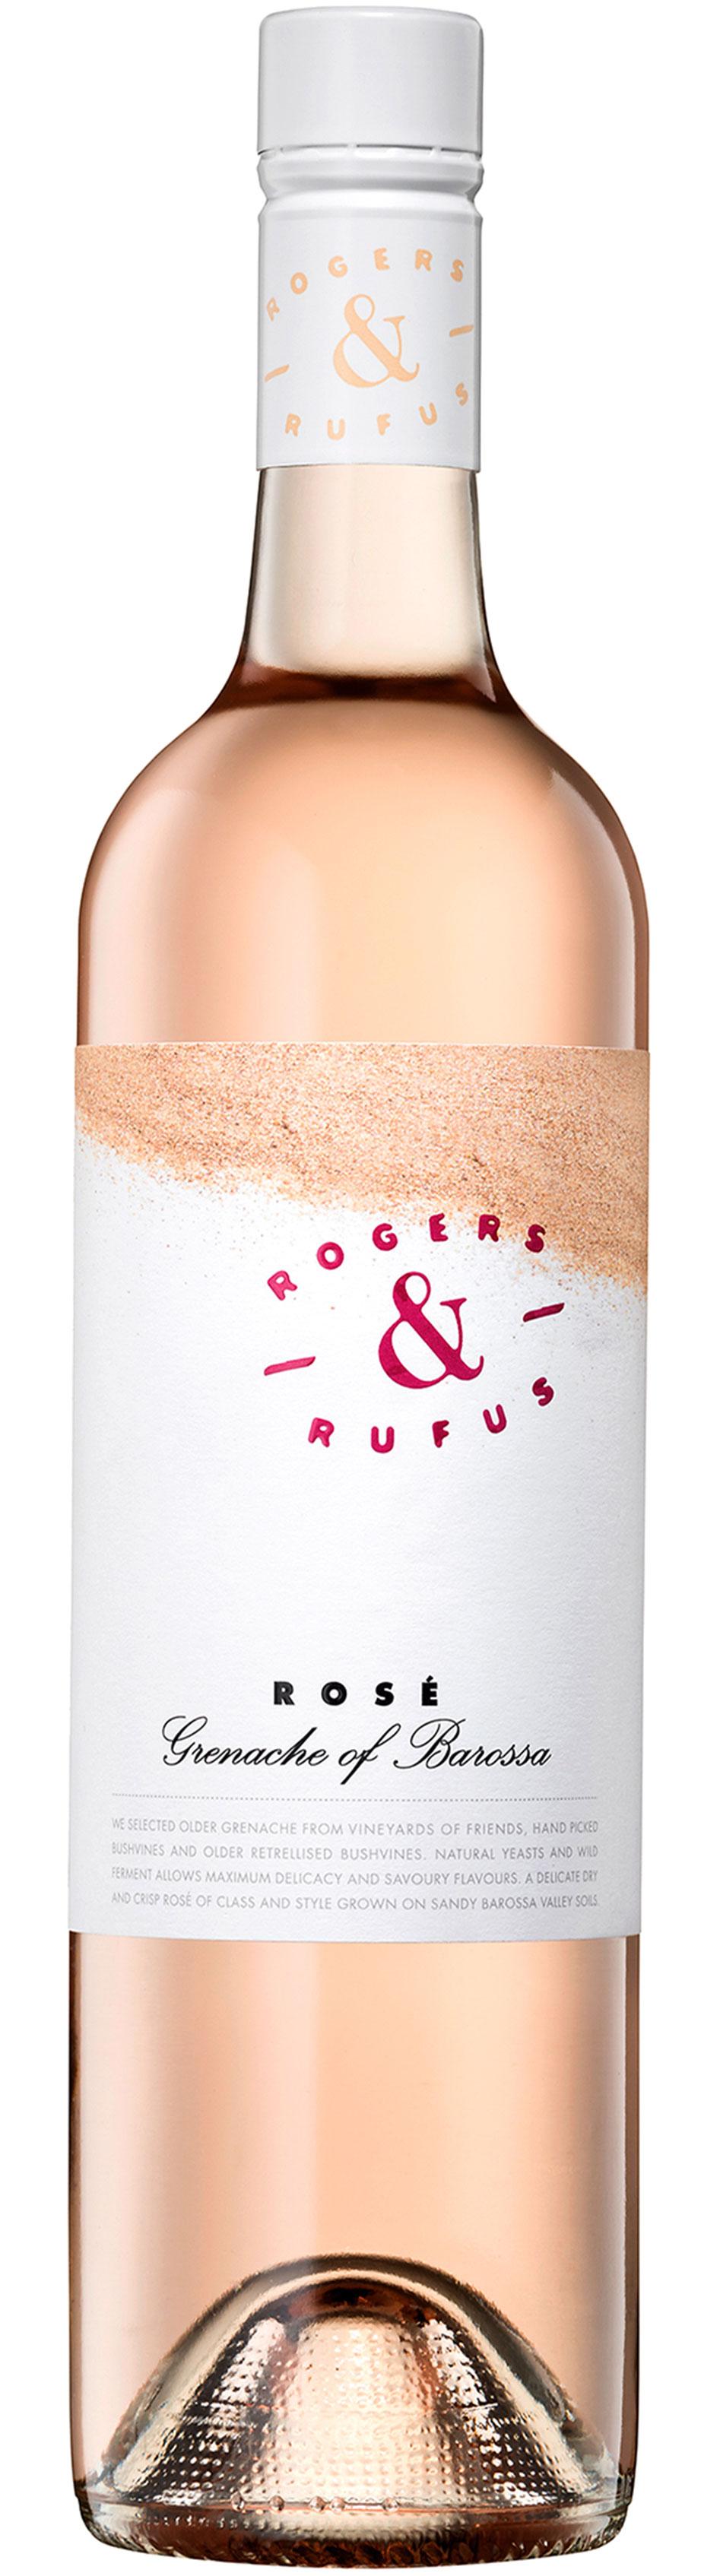 https://vinocorpperu.com/images/vinos/rogersrufus/rogers_rufus_rose_grenache_2019.jpg